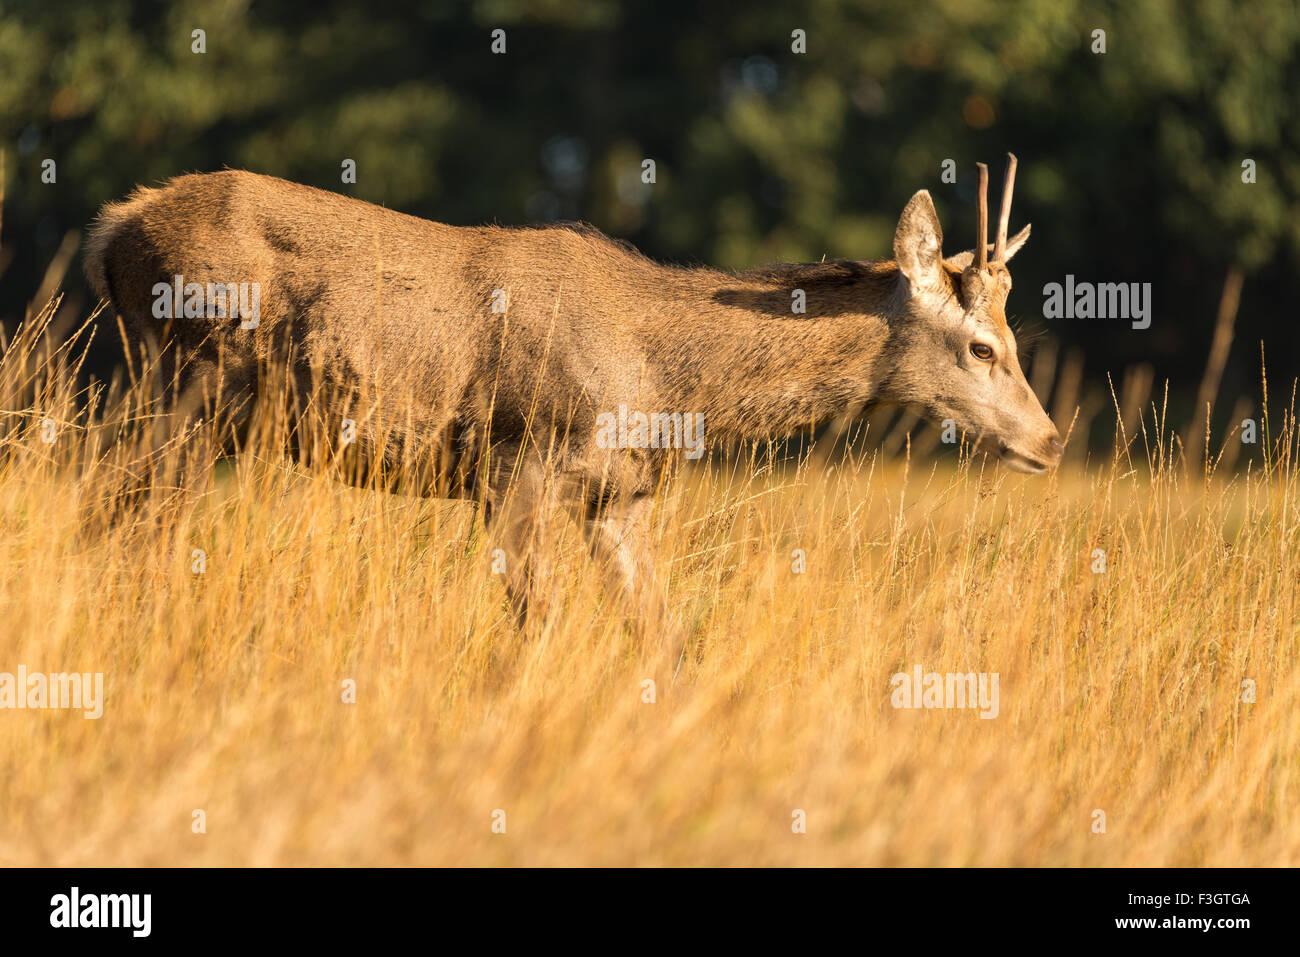 Rotwild-Hirsch (Cervus Elaphus) im Feld. Stockbild